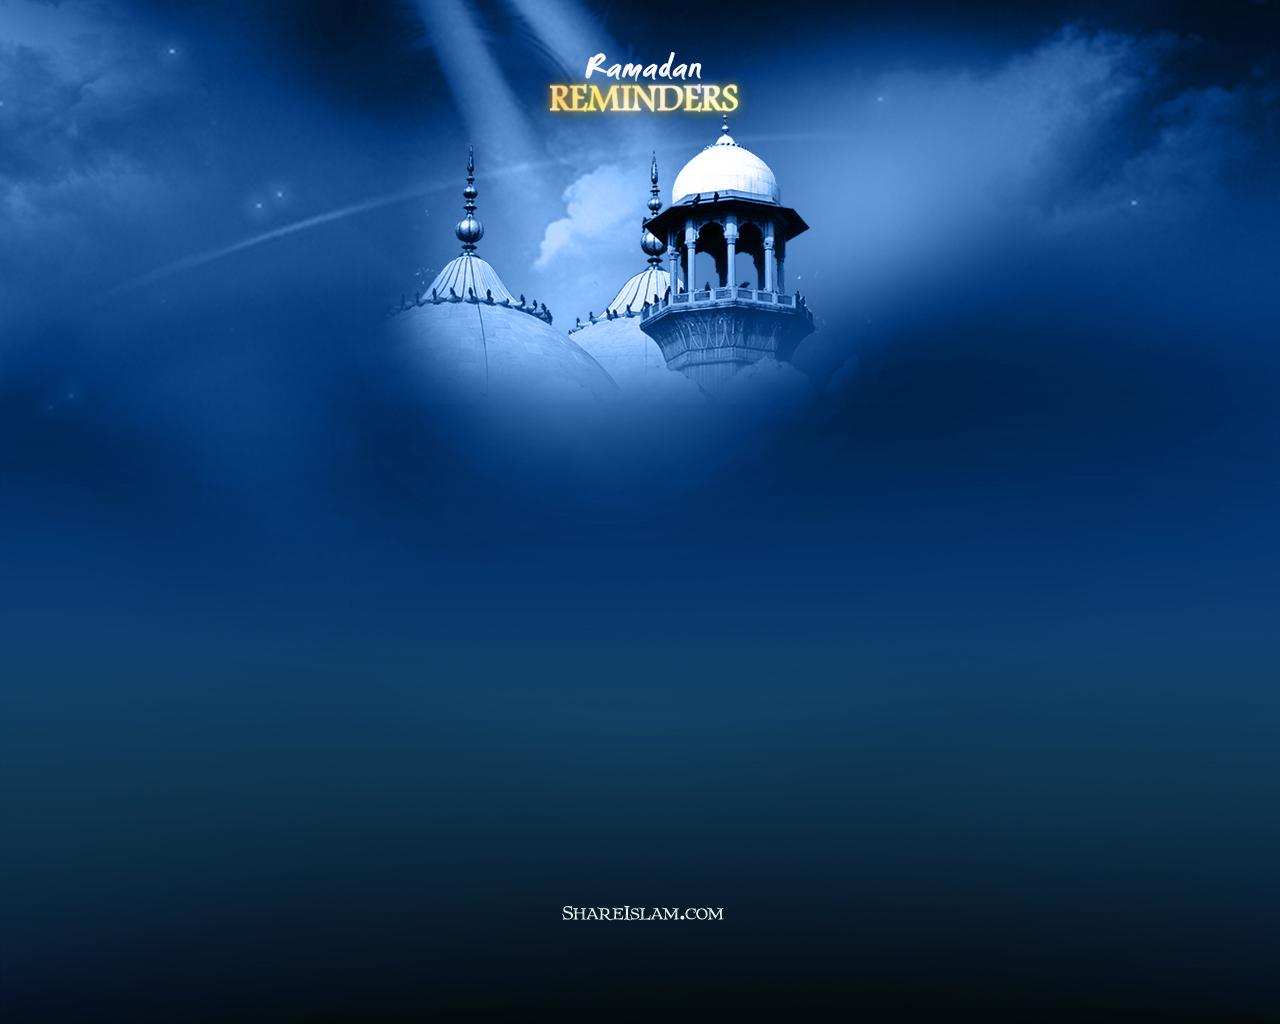 Cool Reminder Ramadan Wallpaper - ShareIslam_Ramadan_03_1280x1024  Trends_55555 .jpg